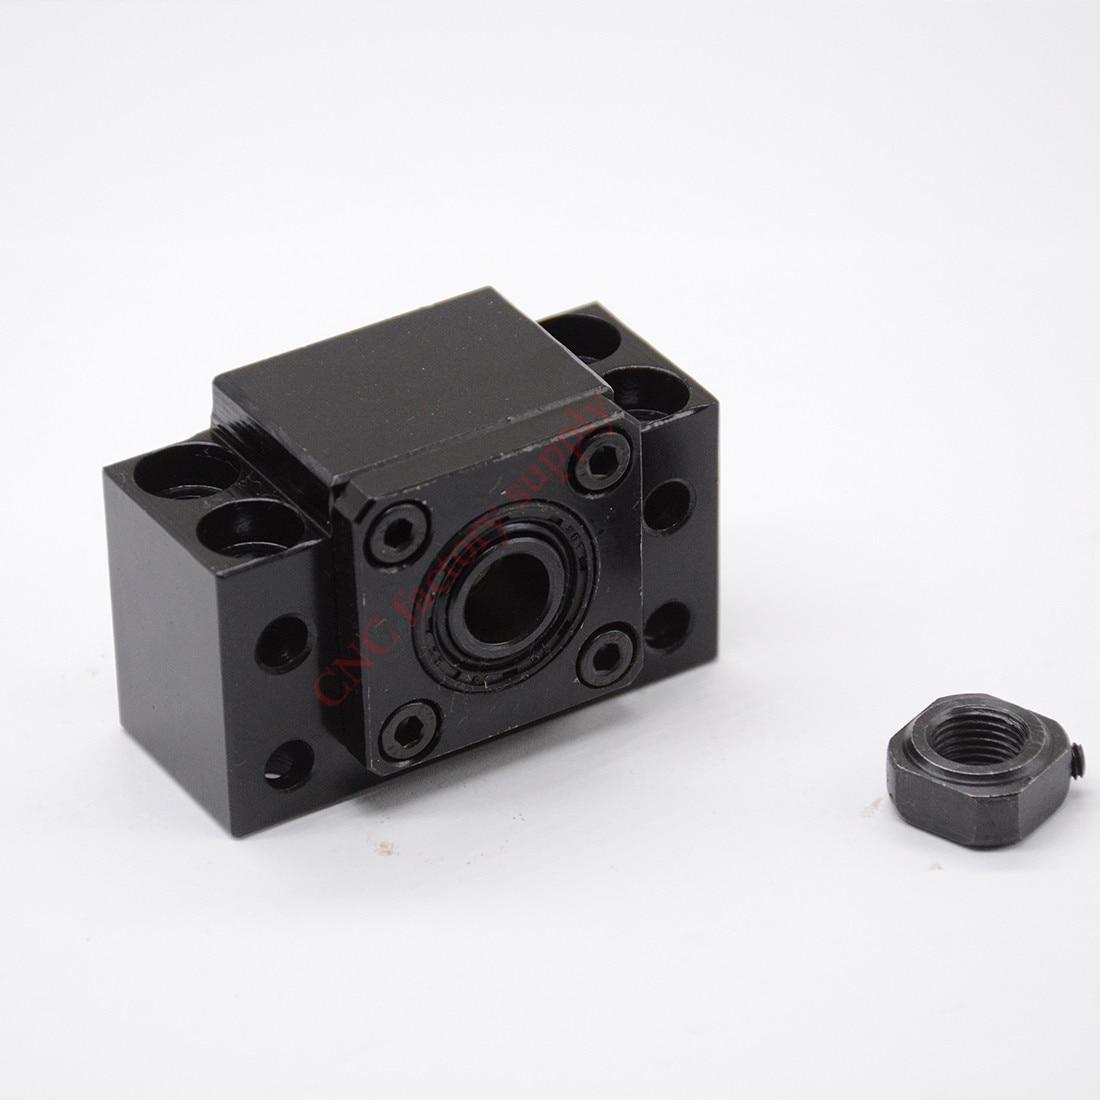 1pcs BK10 Ballscrew End Supports ballscrew End Support CNC Parts